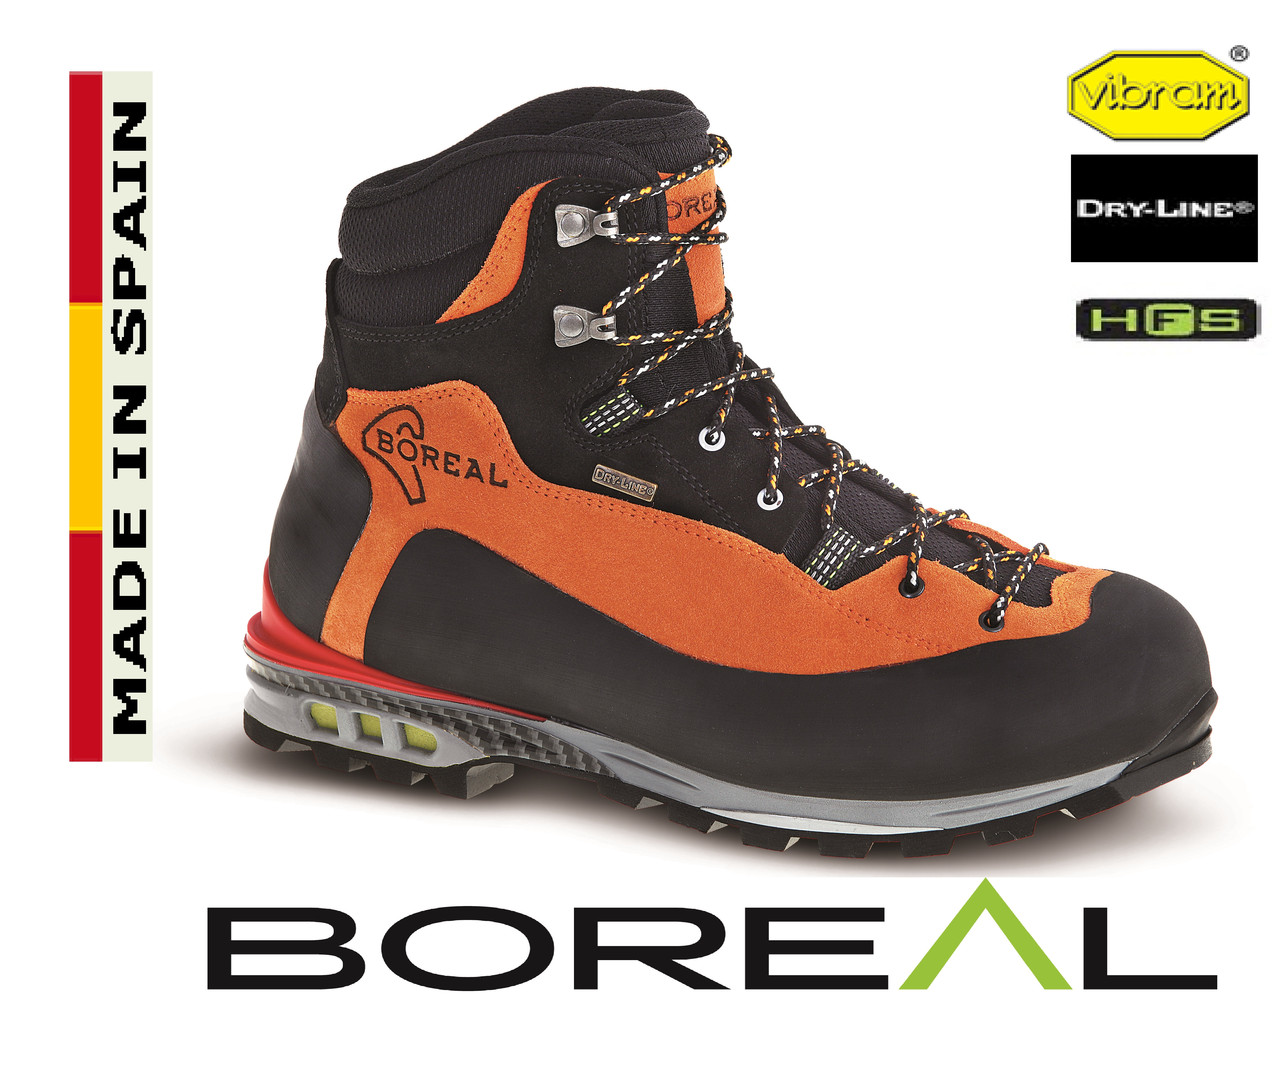 Ботинки для альпинизма Boreal Brenta.